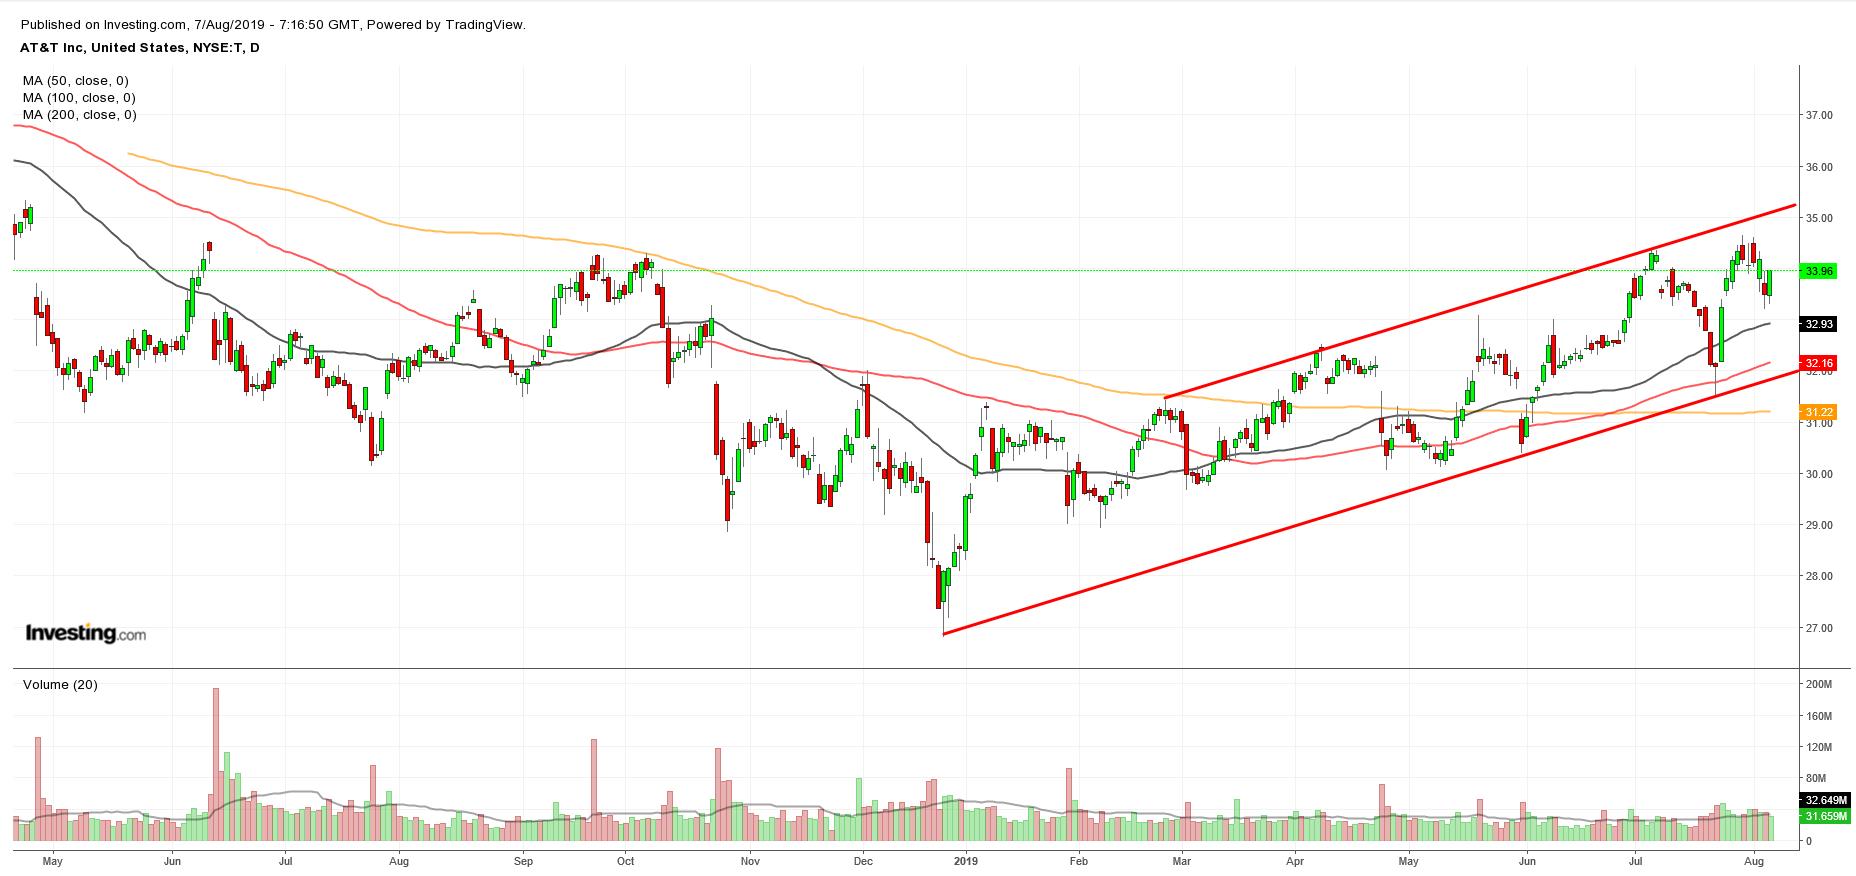 AT&T股价